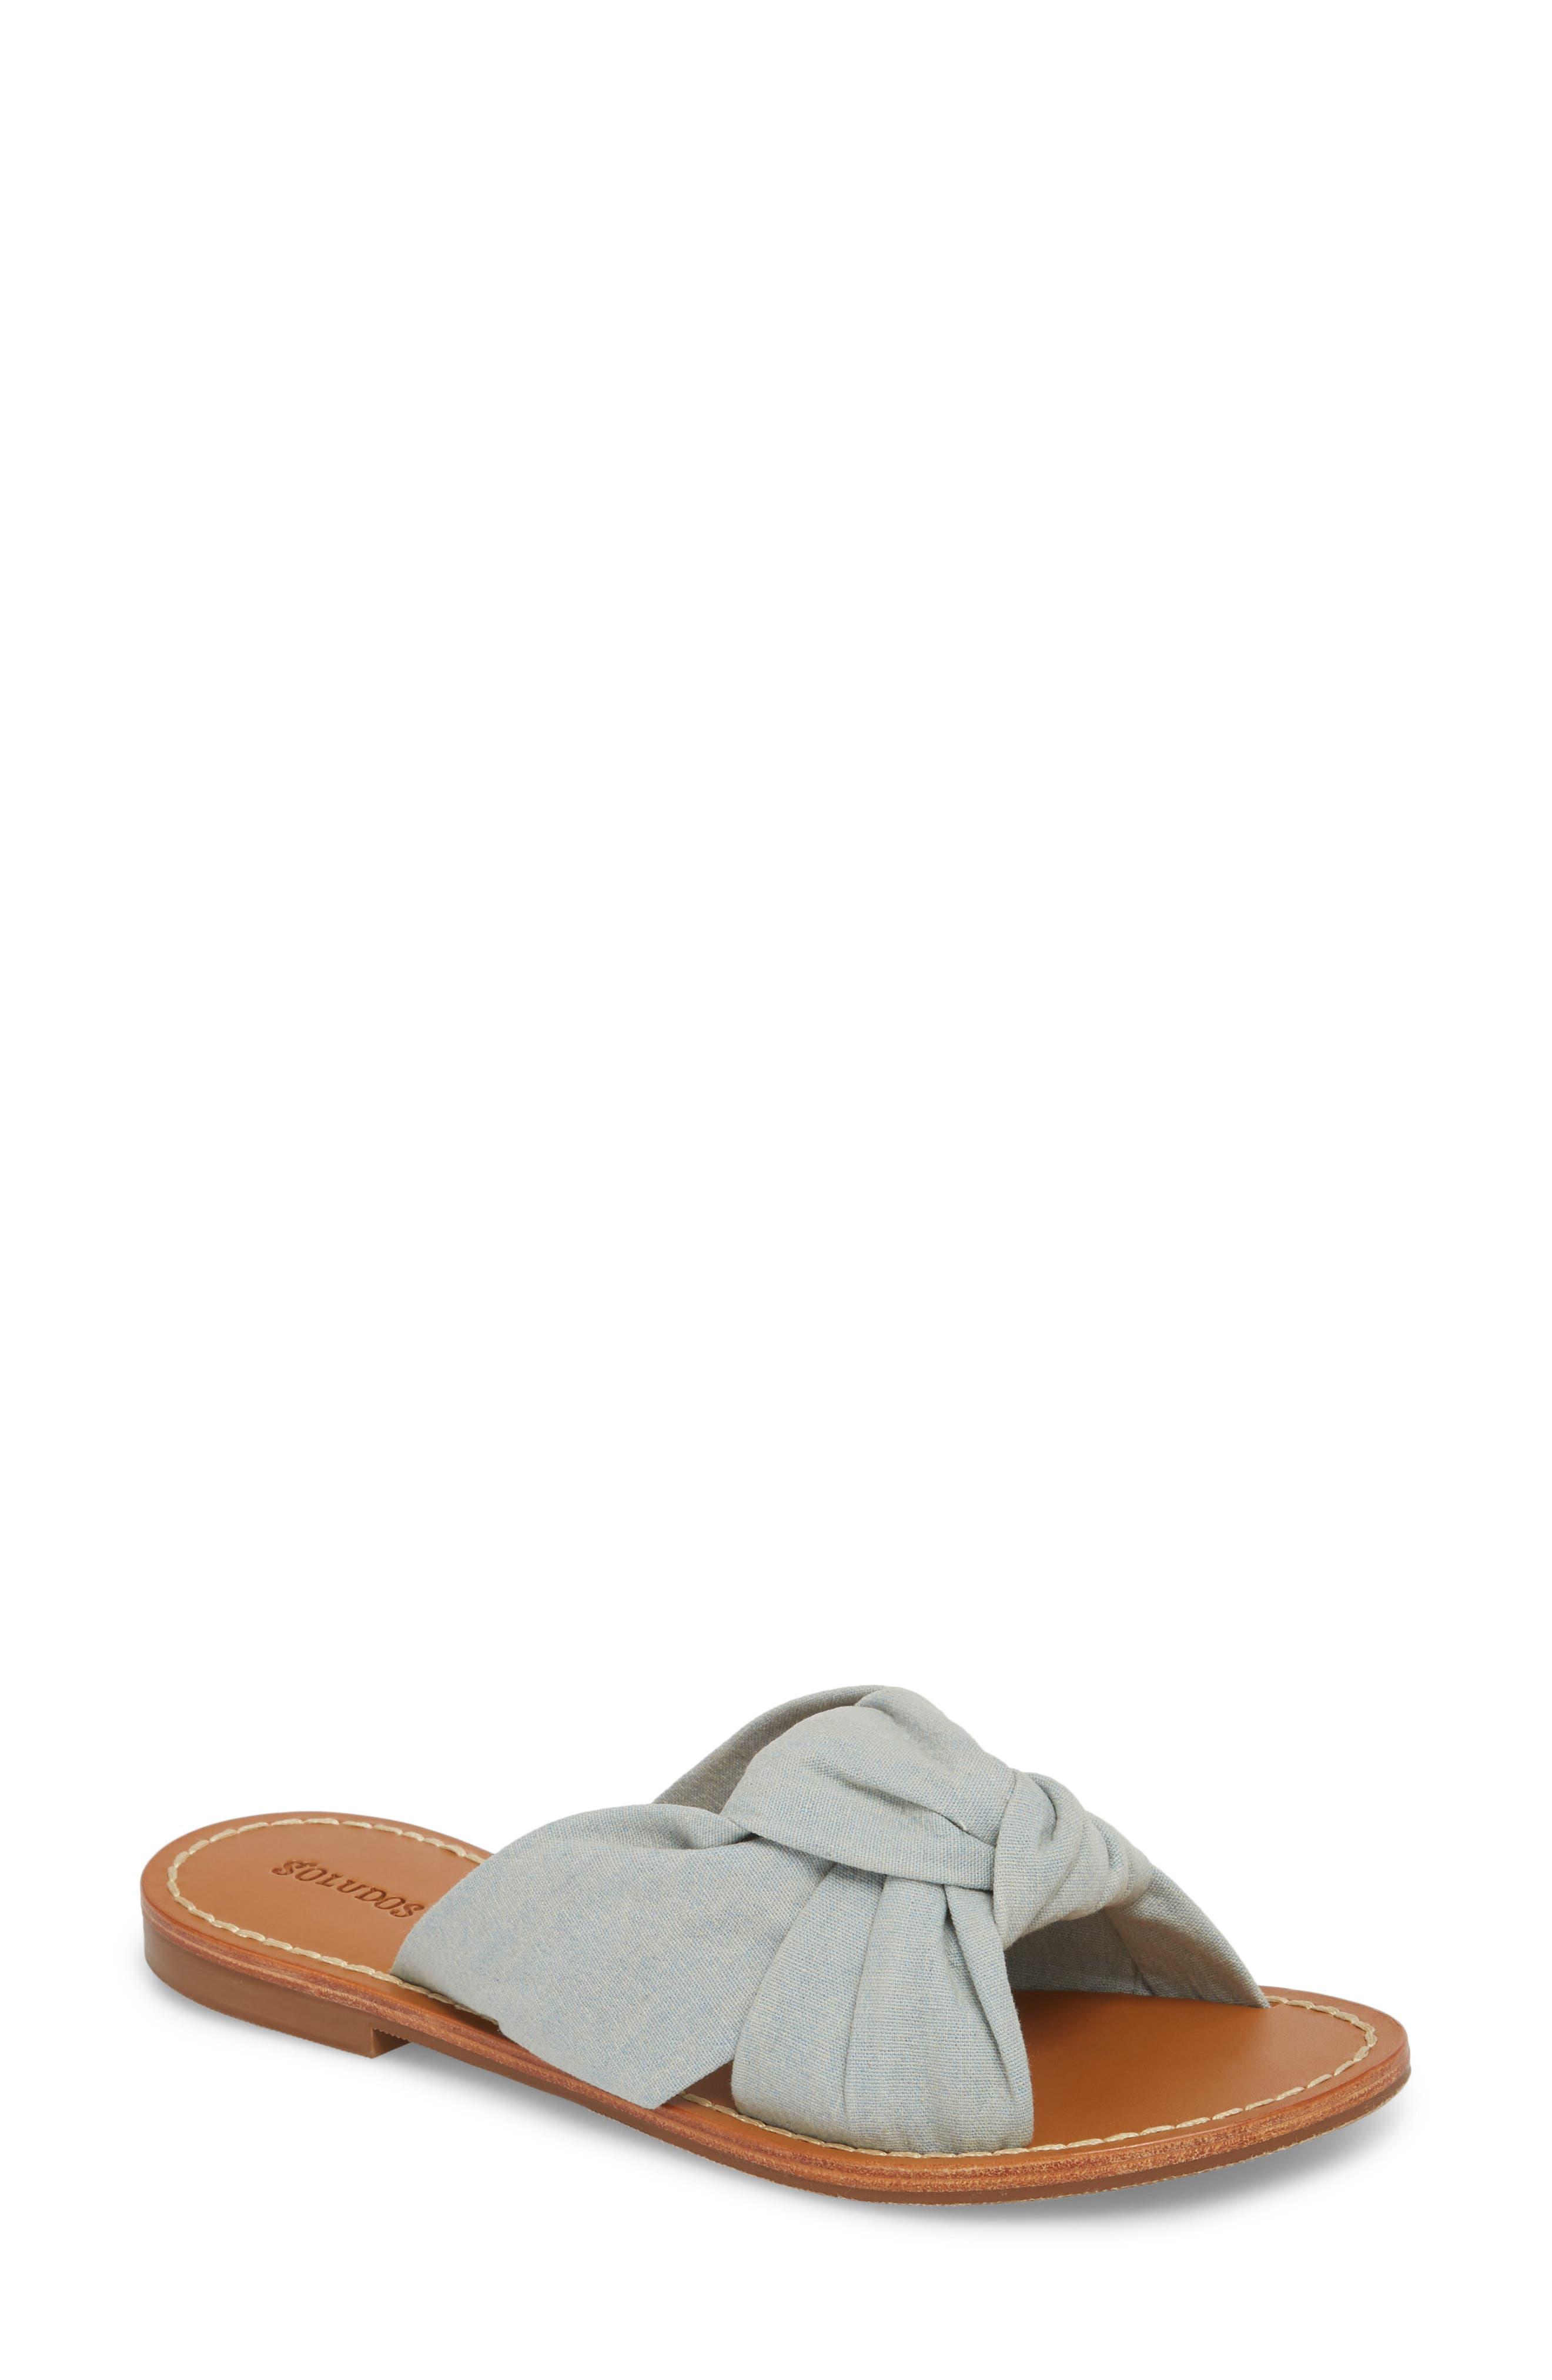 Soludos Knotted Slide Sandal (Women)